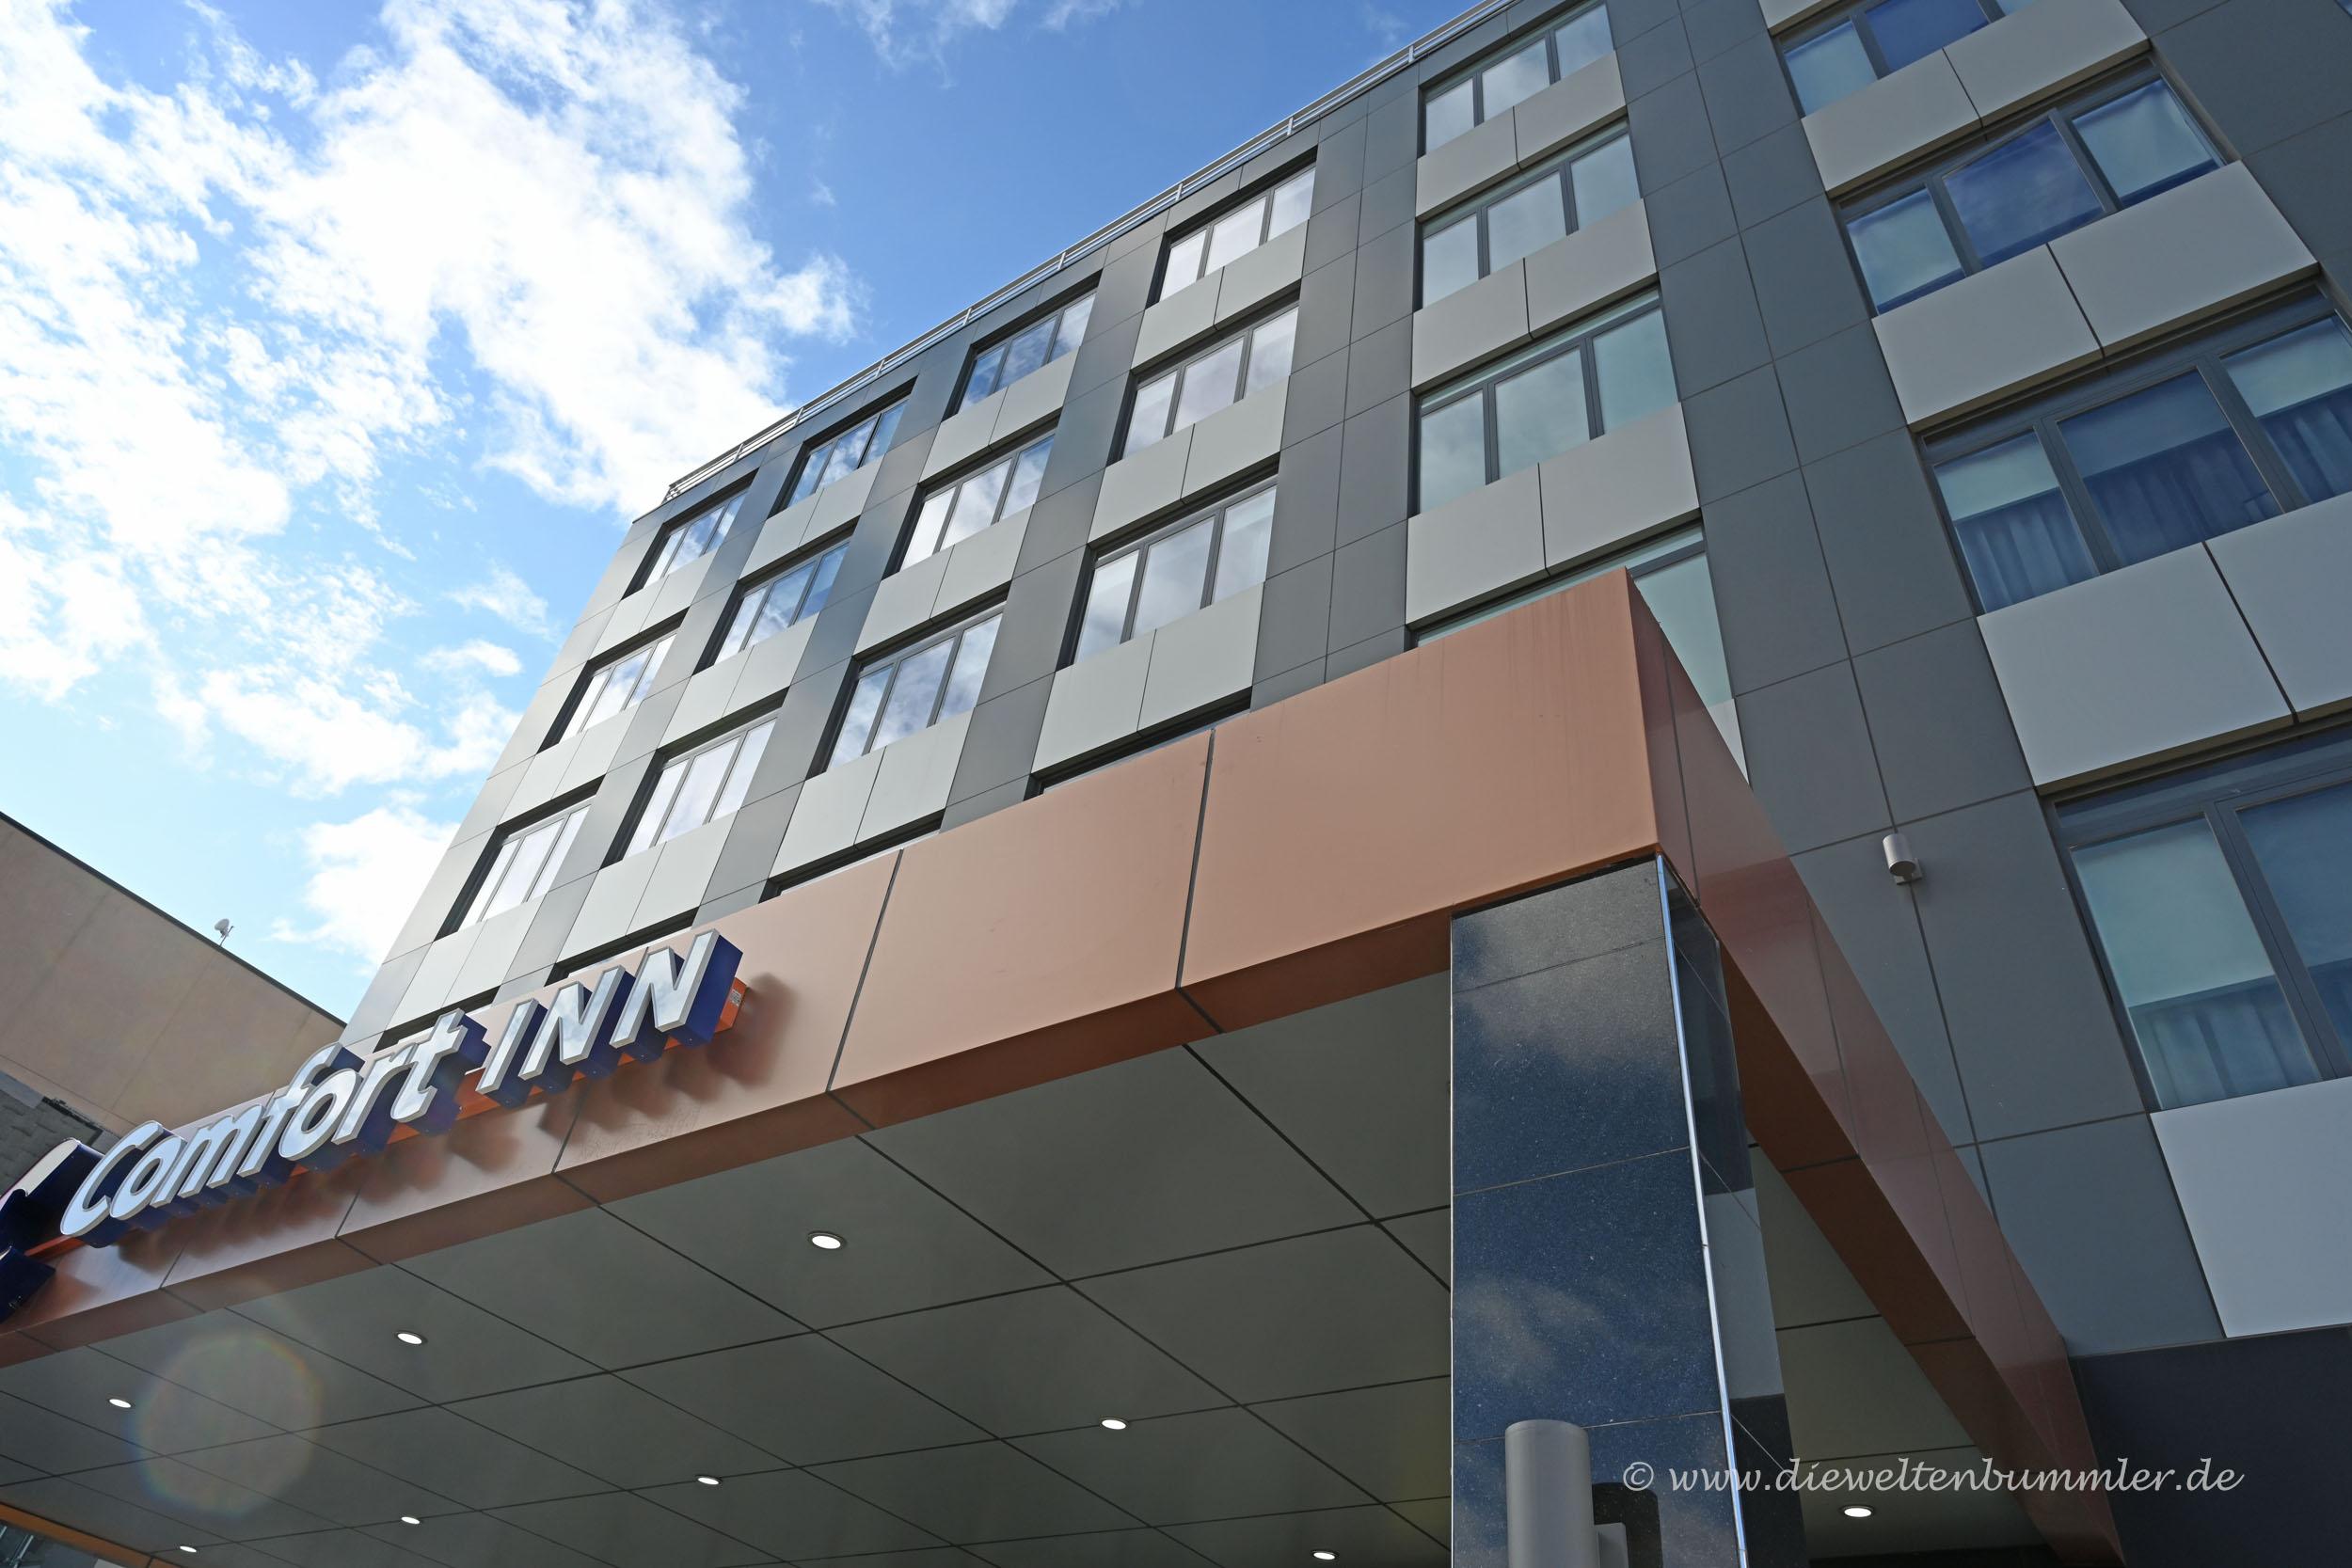 Comfort Inn in Brooklyn